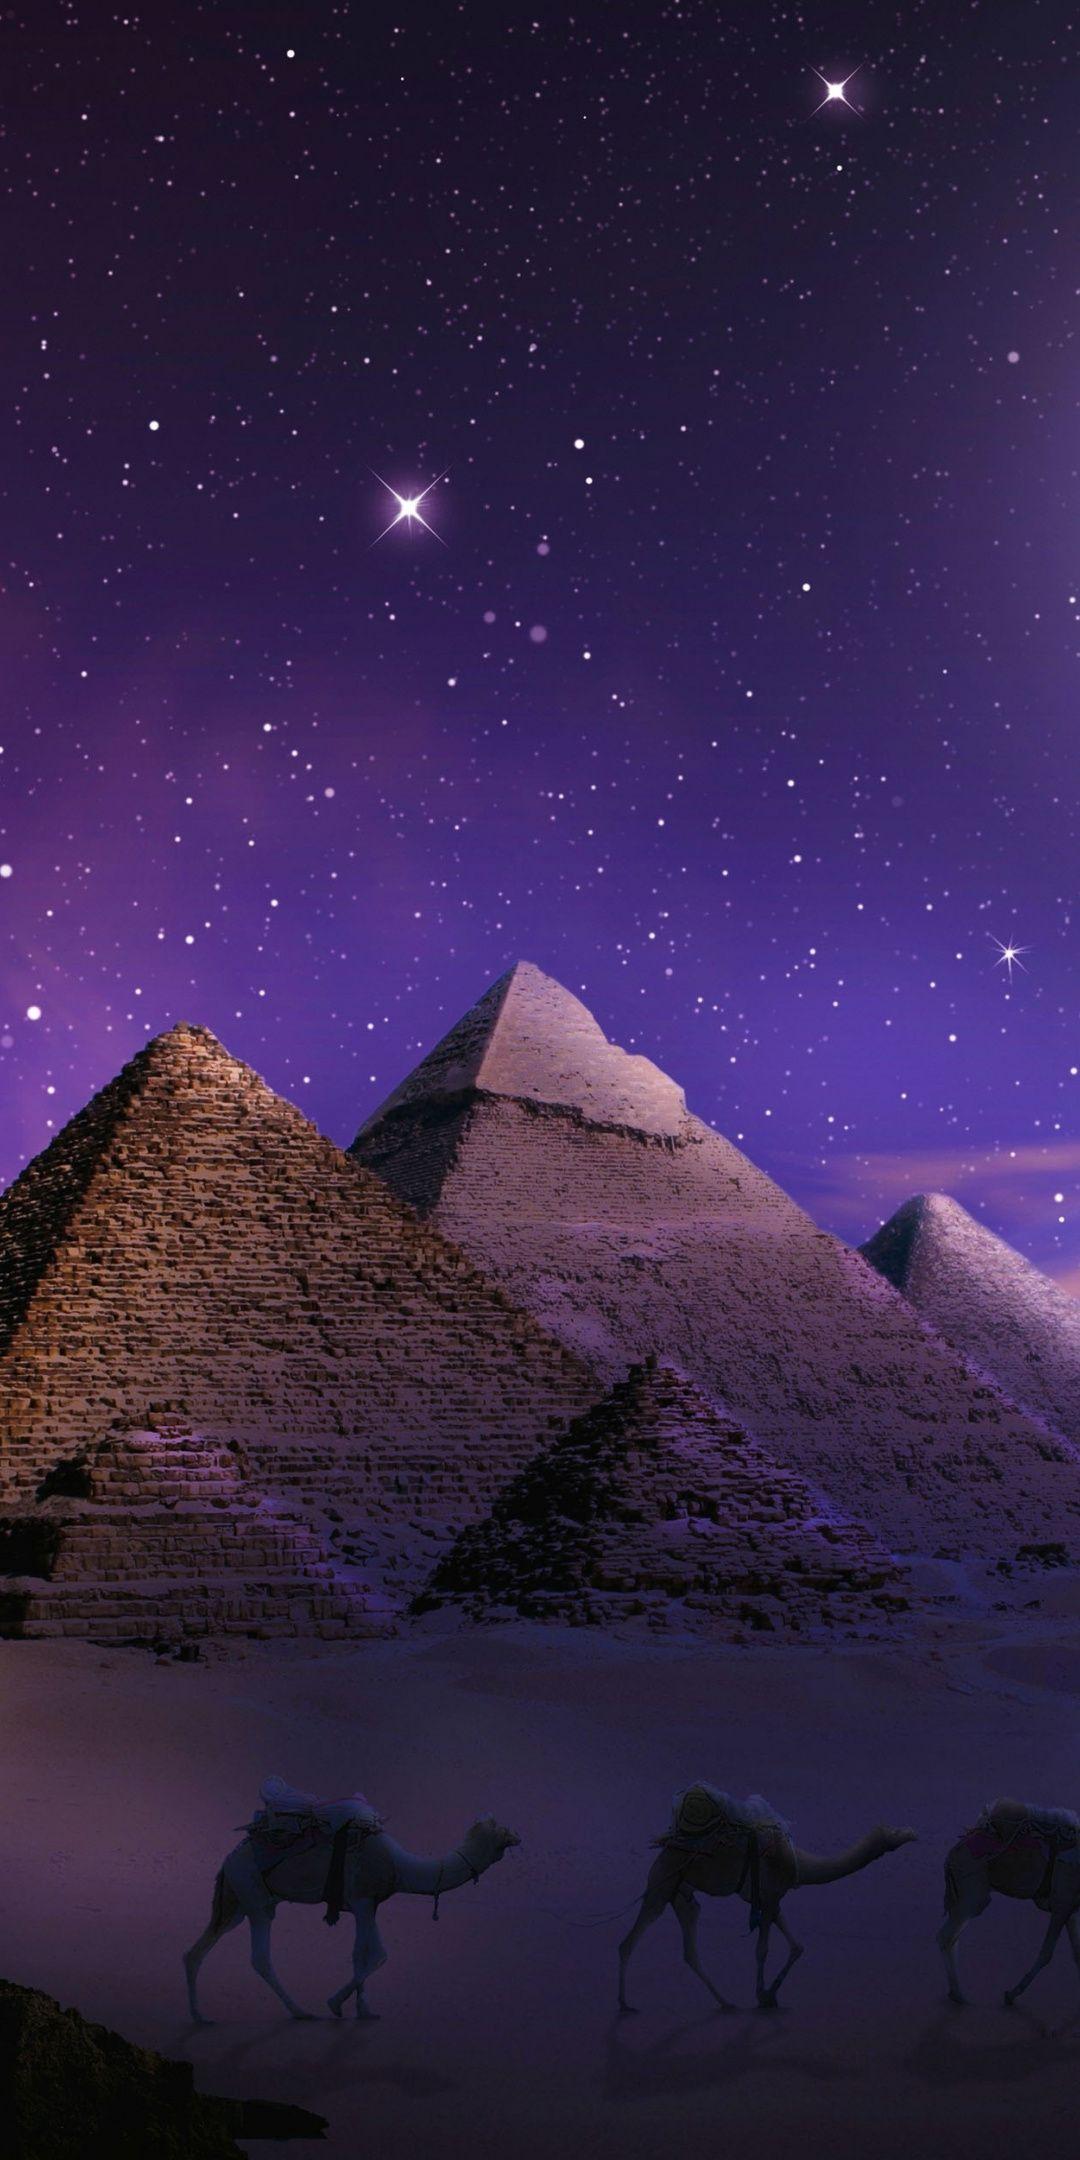 Photoshop Pyramids Egypt Night 1080x2160 Wallpaper Egypt Wallpaper Pyramids Egypt Egypt Art